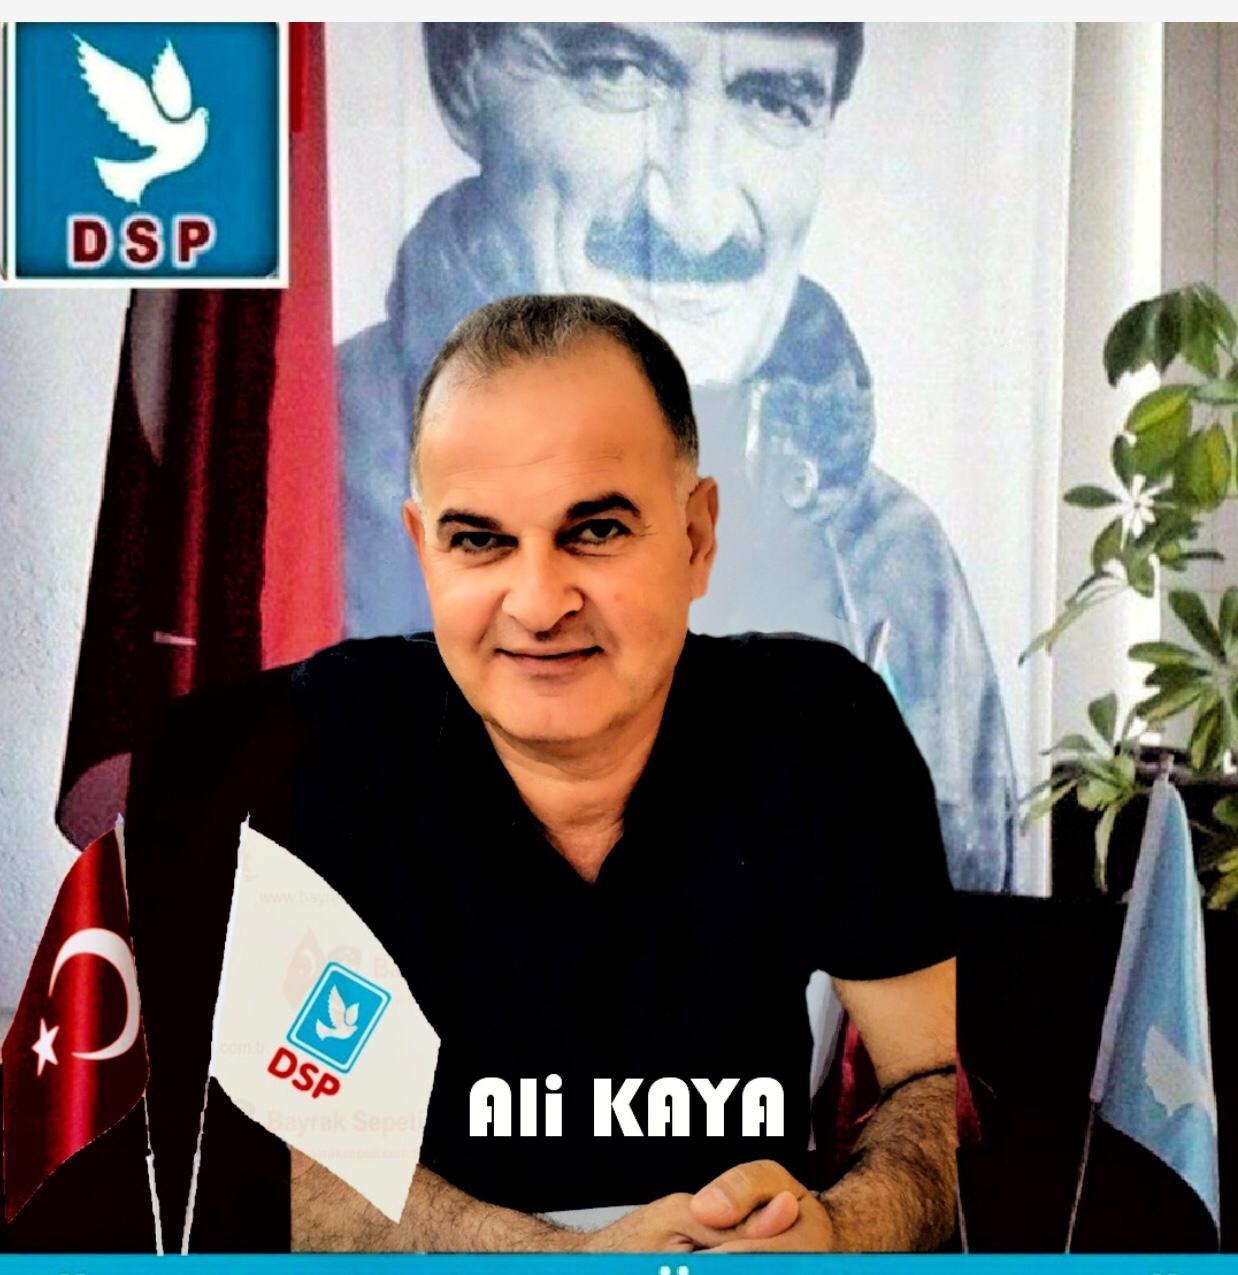 Arsuz DSP İlçe Başkanı Ali Kaya,